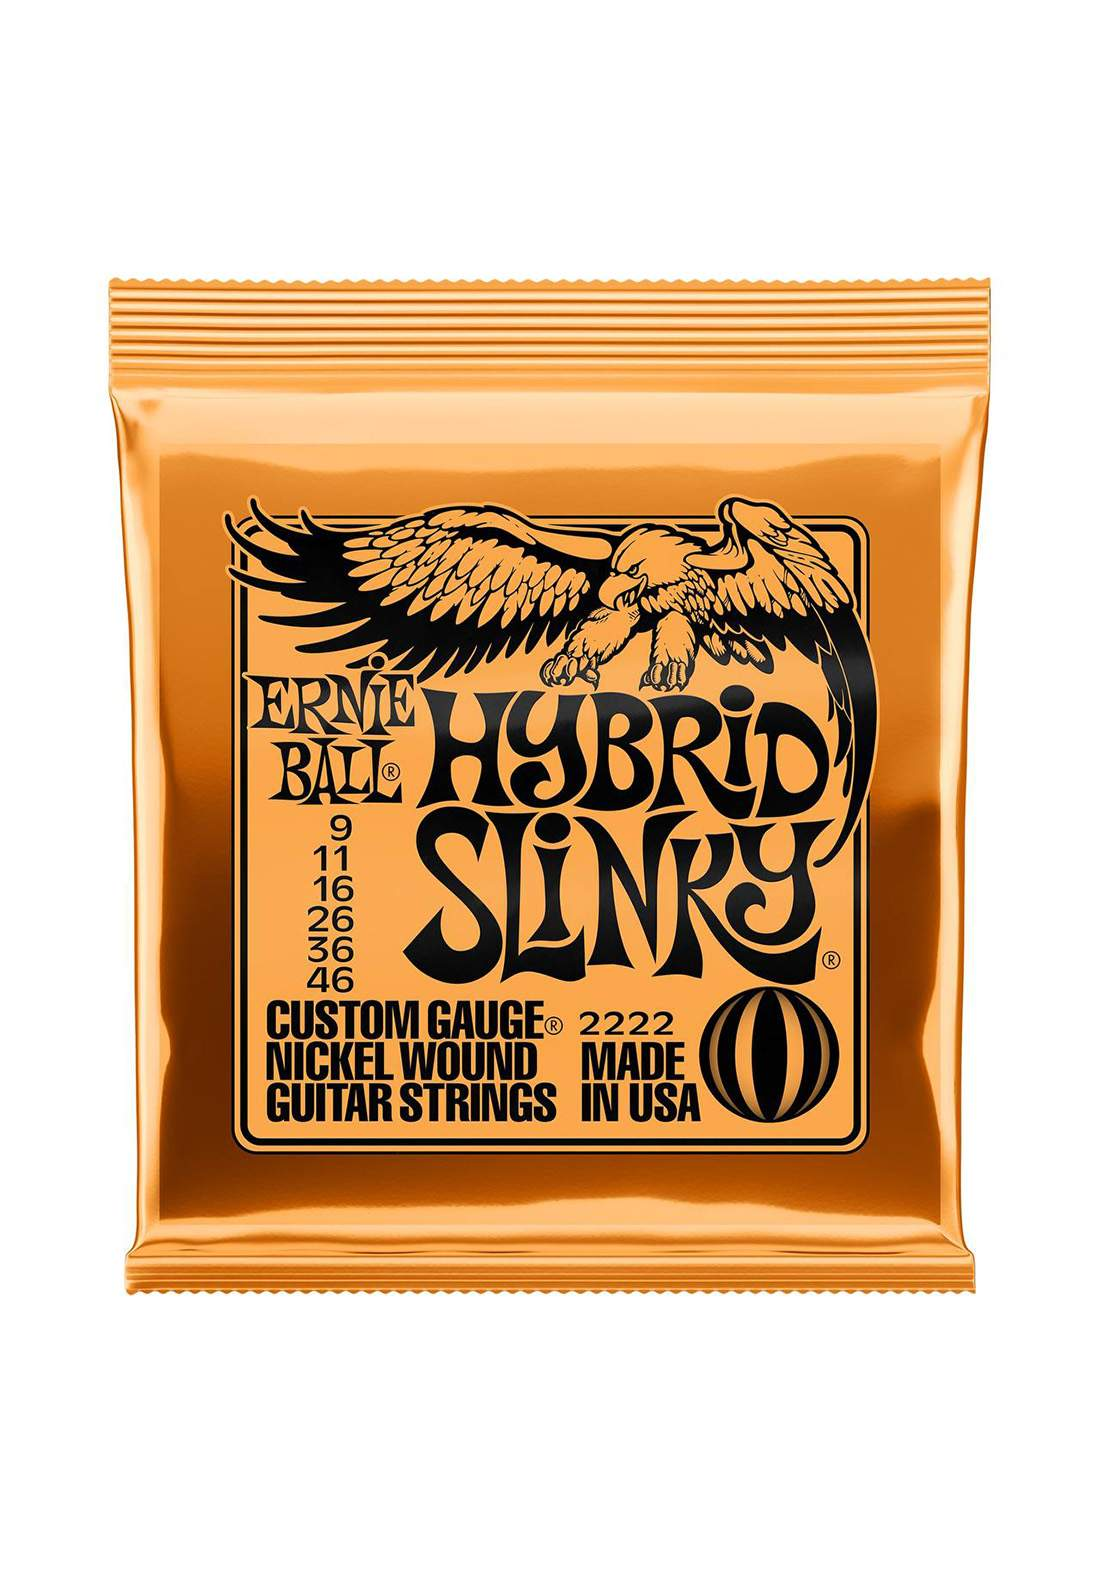 Electric Guitar Ernie Ball Strings 2222 Hybird Slinky - اوتار جيتار